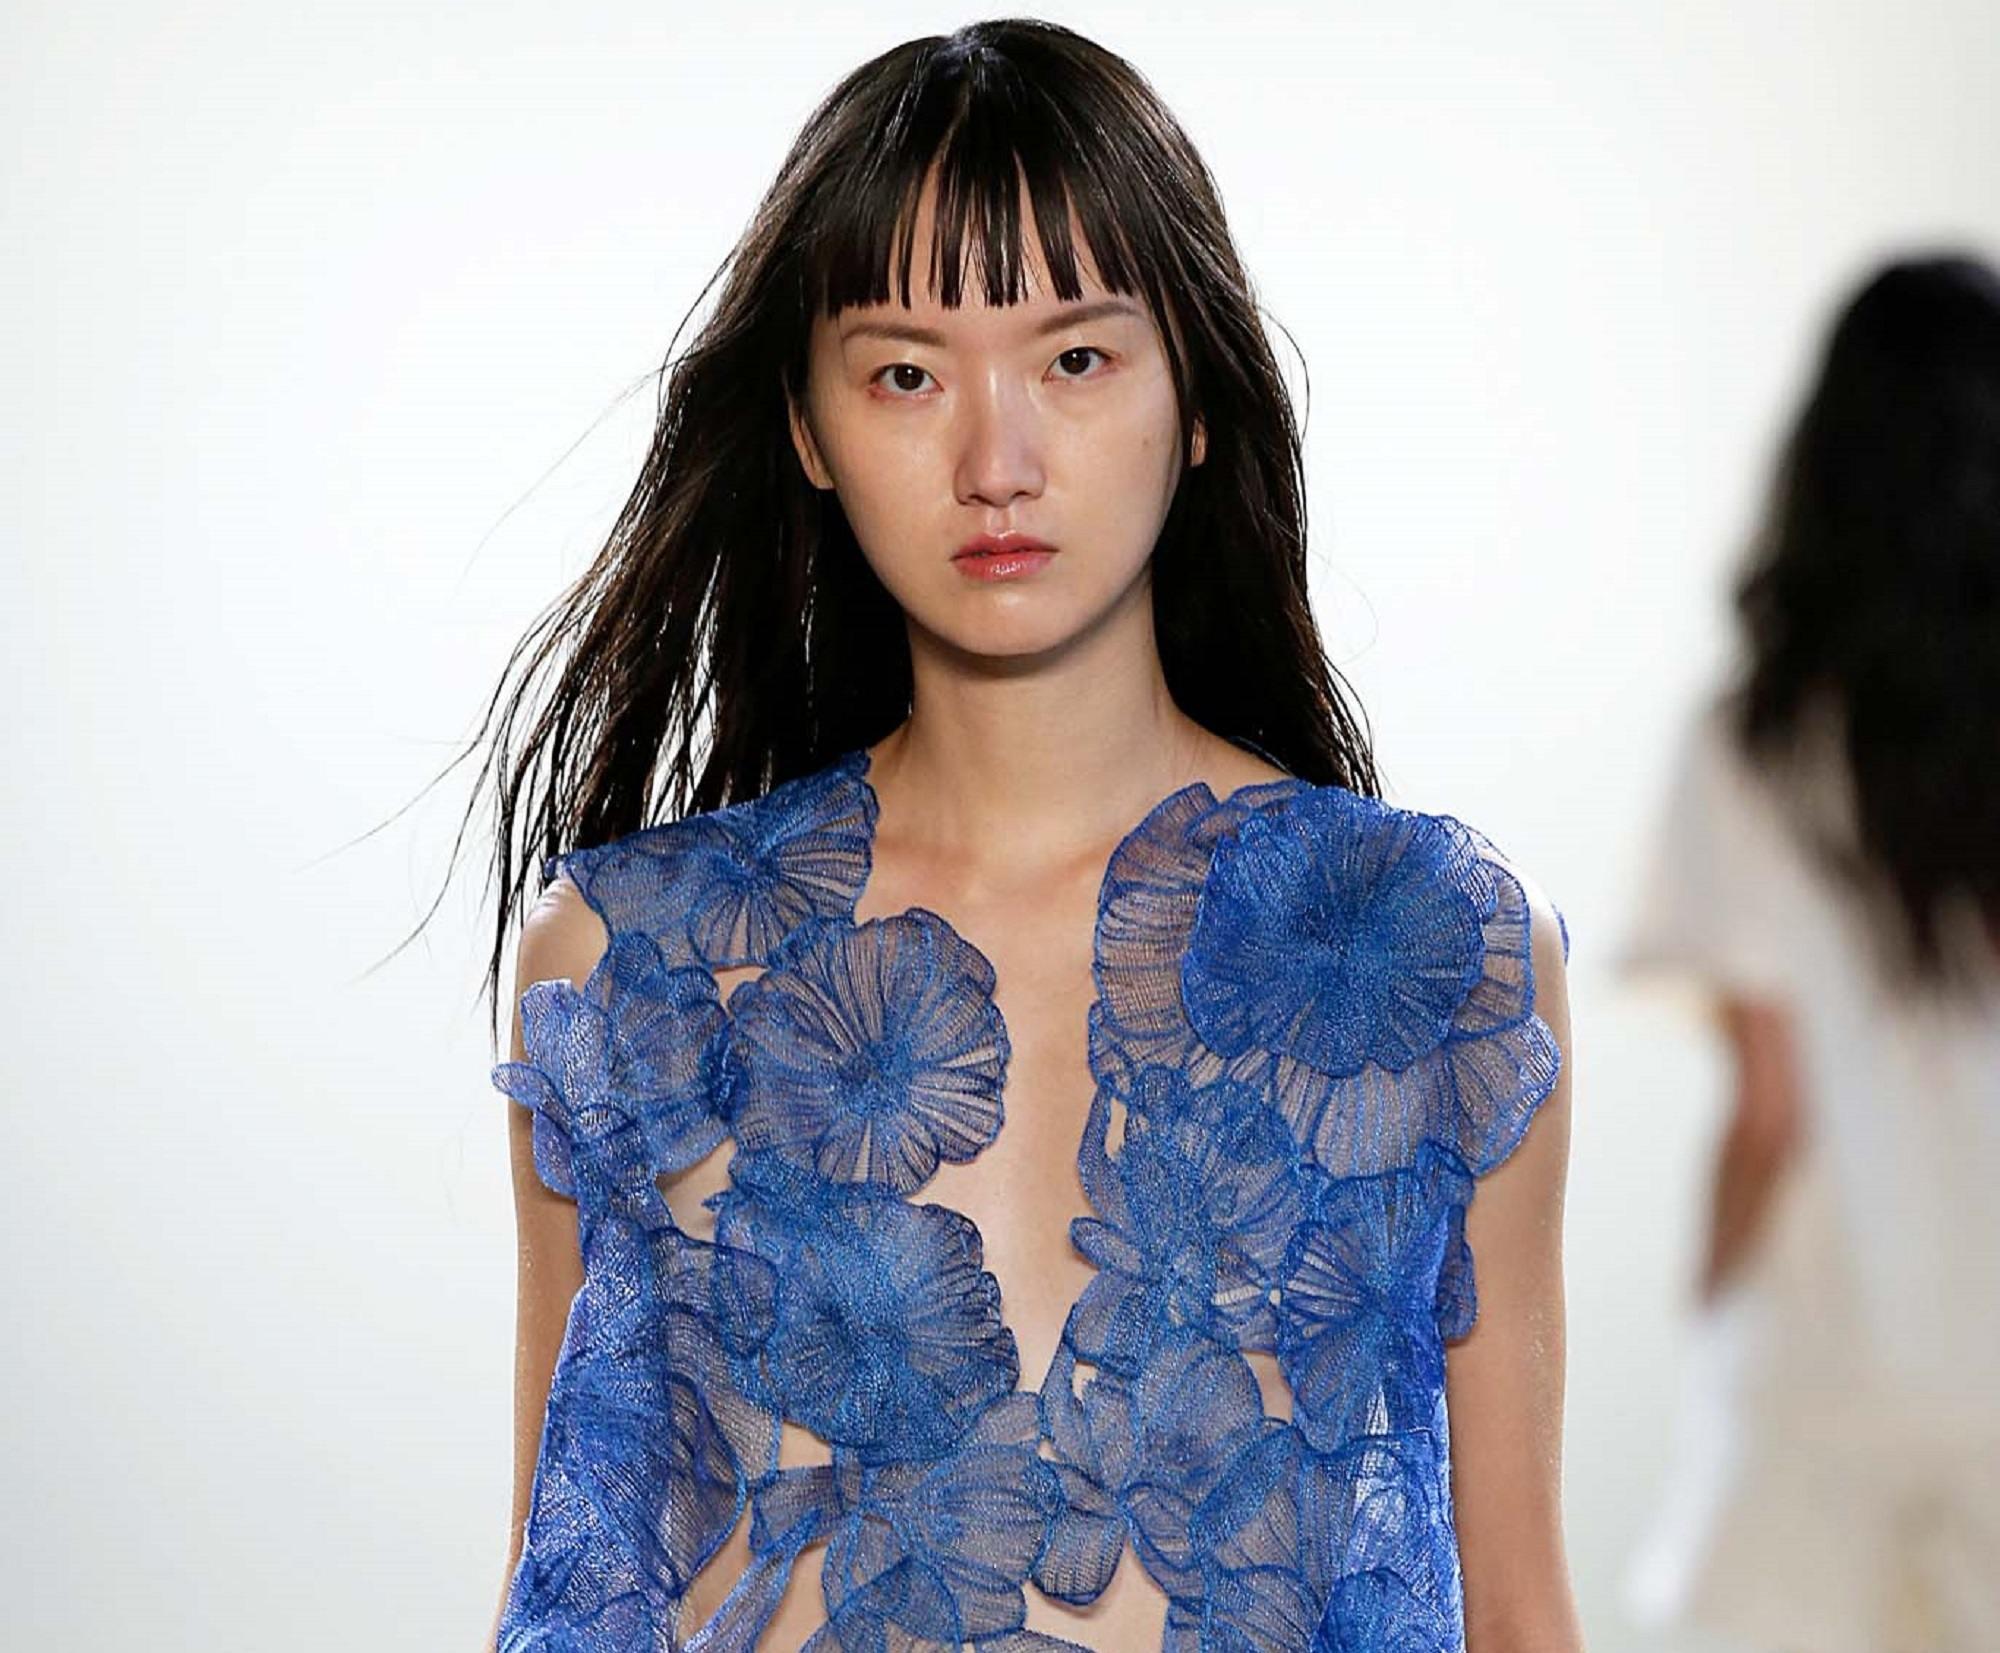 Long black hair: Closeup shot of Asian model with long black hair with bangs wearing a blue dress